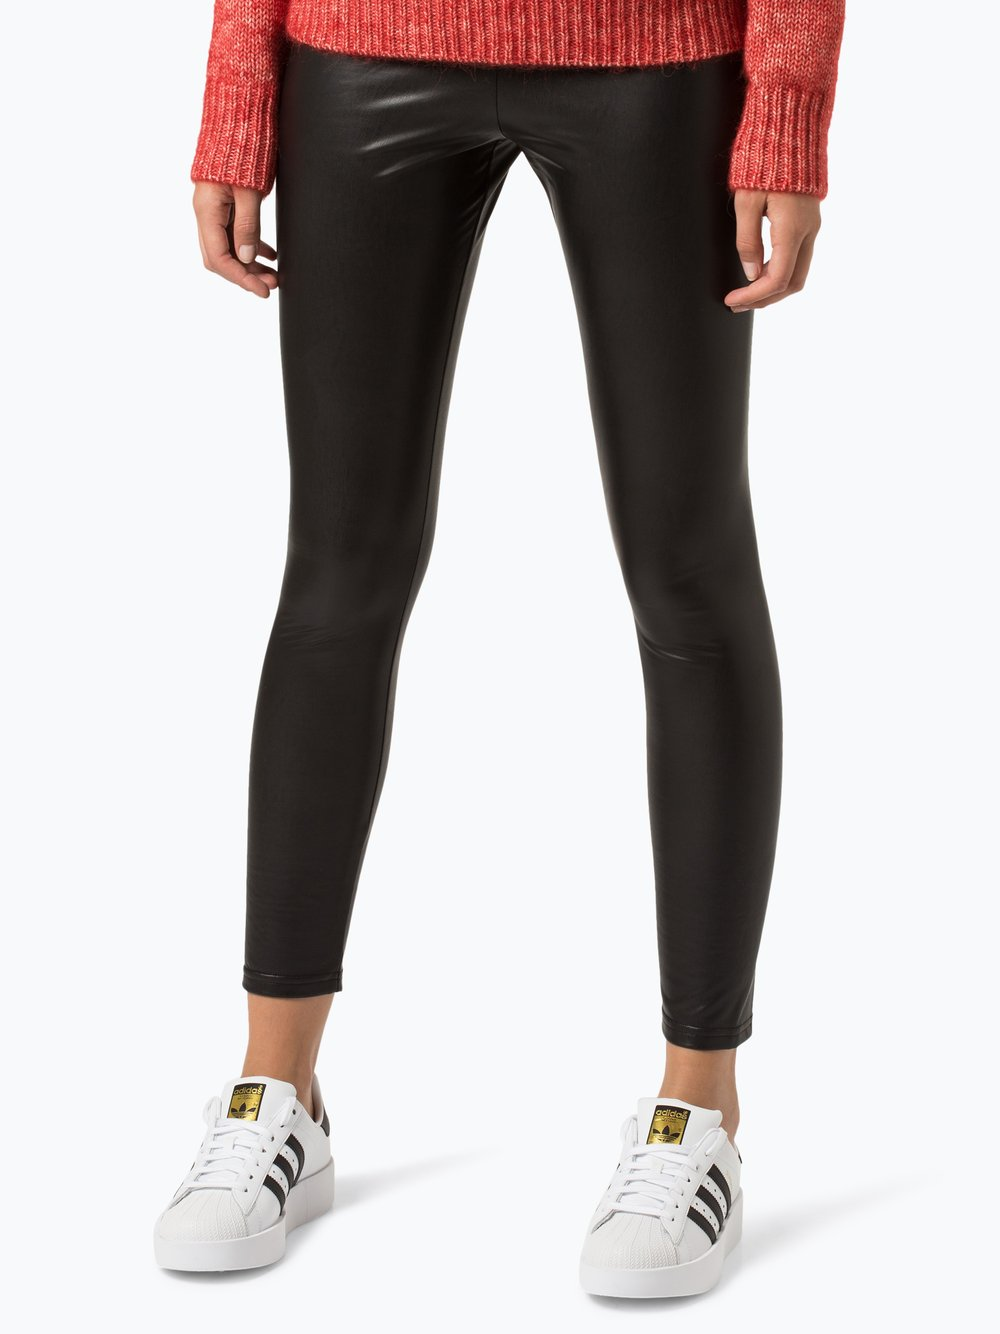 GUESS Damen Leggings online kaufen   VANGRAAF.COM